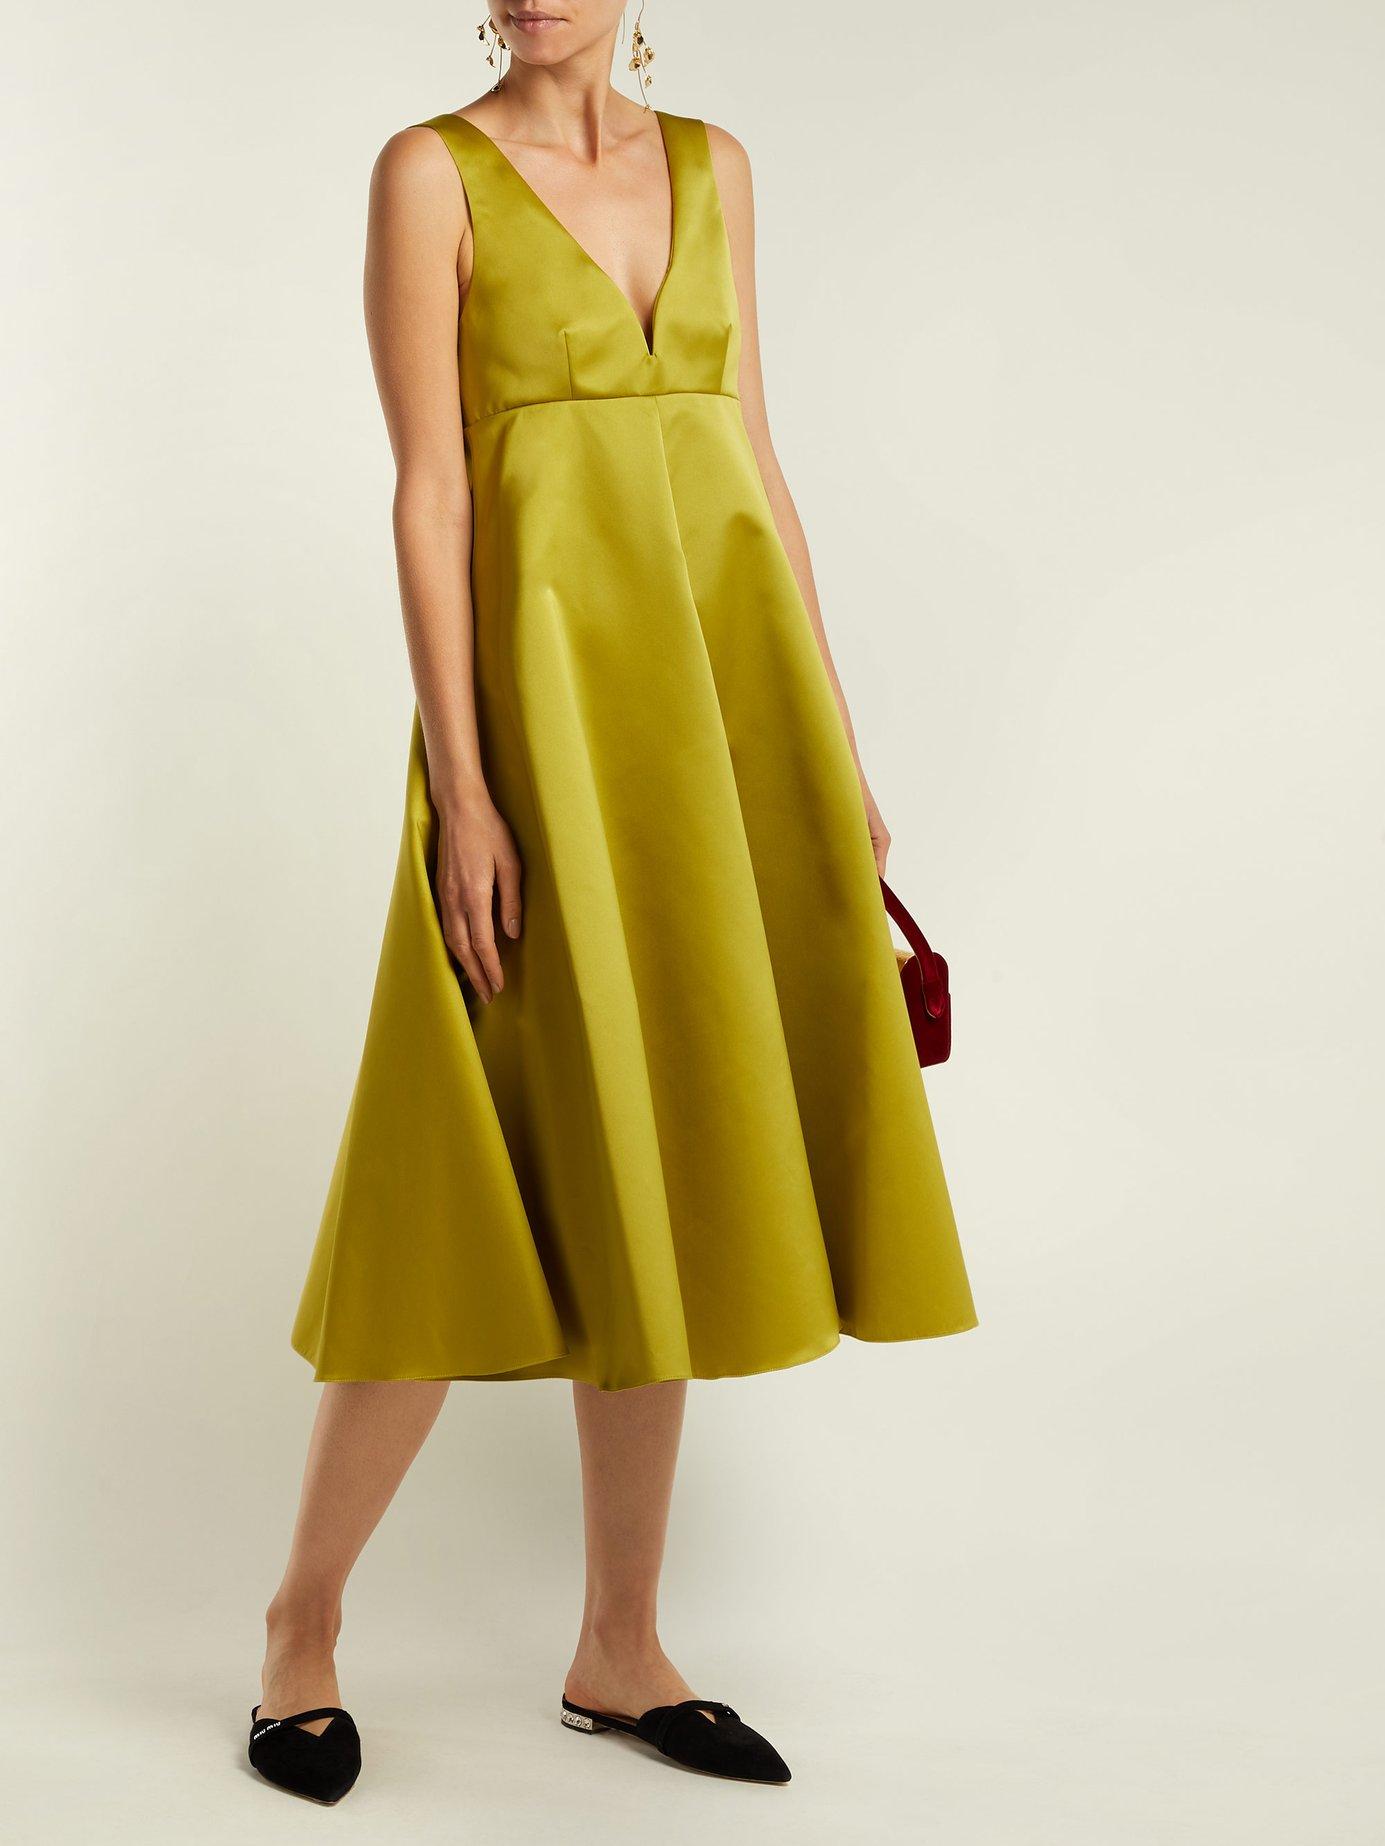 Duchess-satin midi dress by Rochas